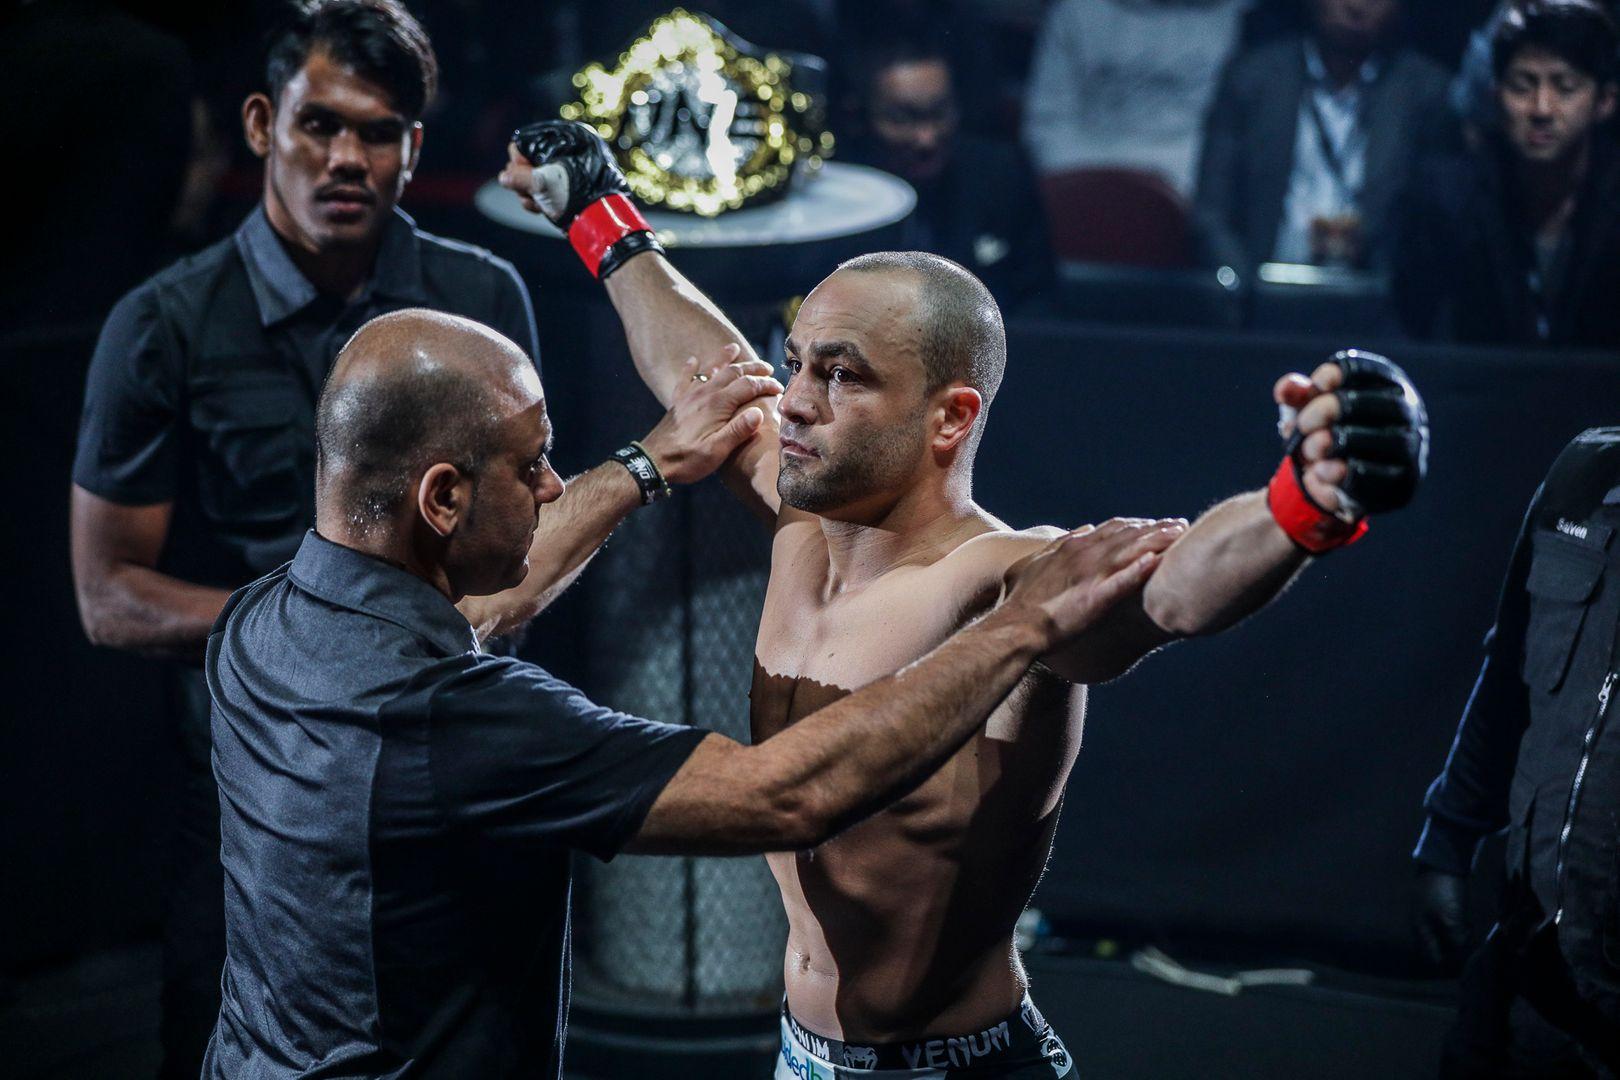 american martial arts legend Eddie Alvarez